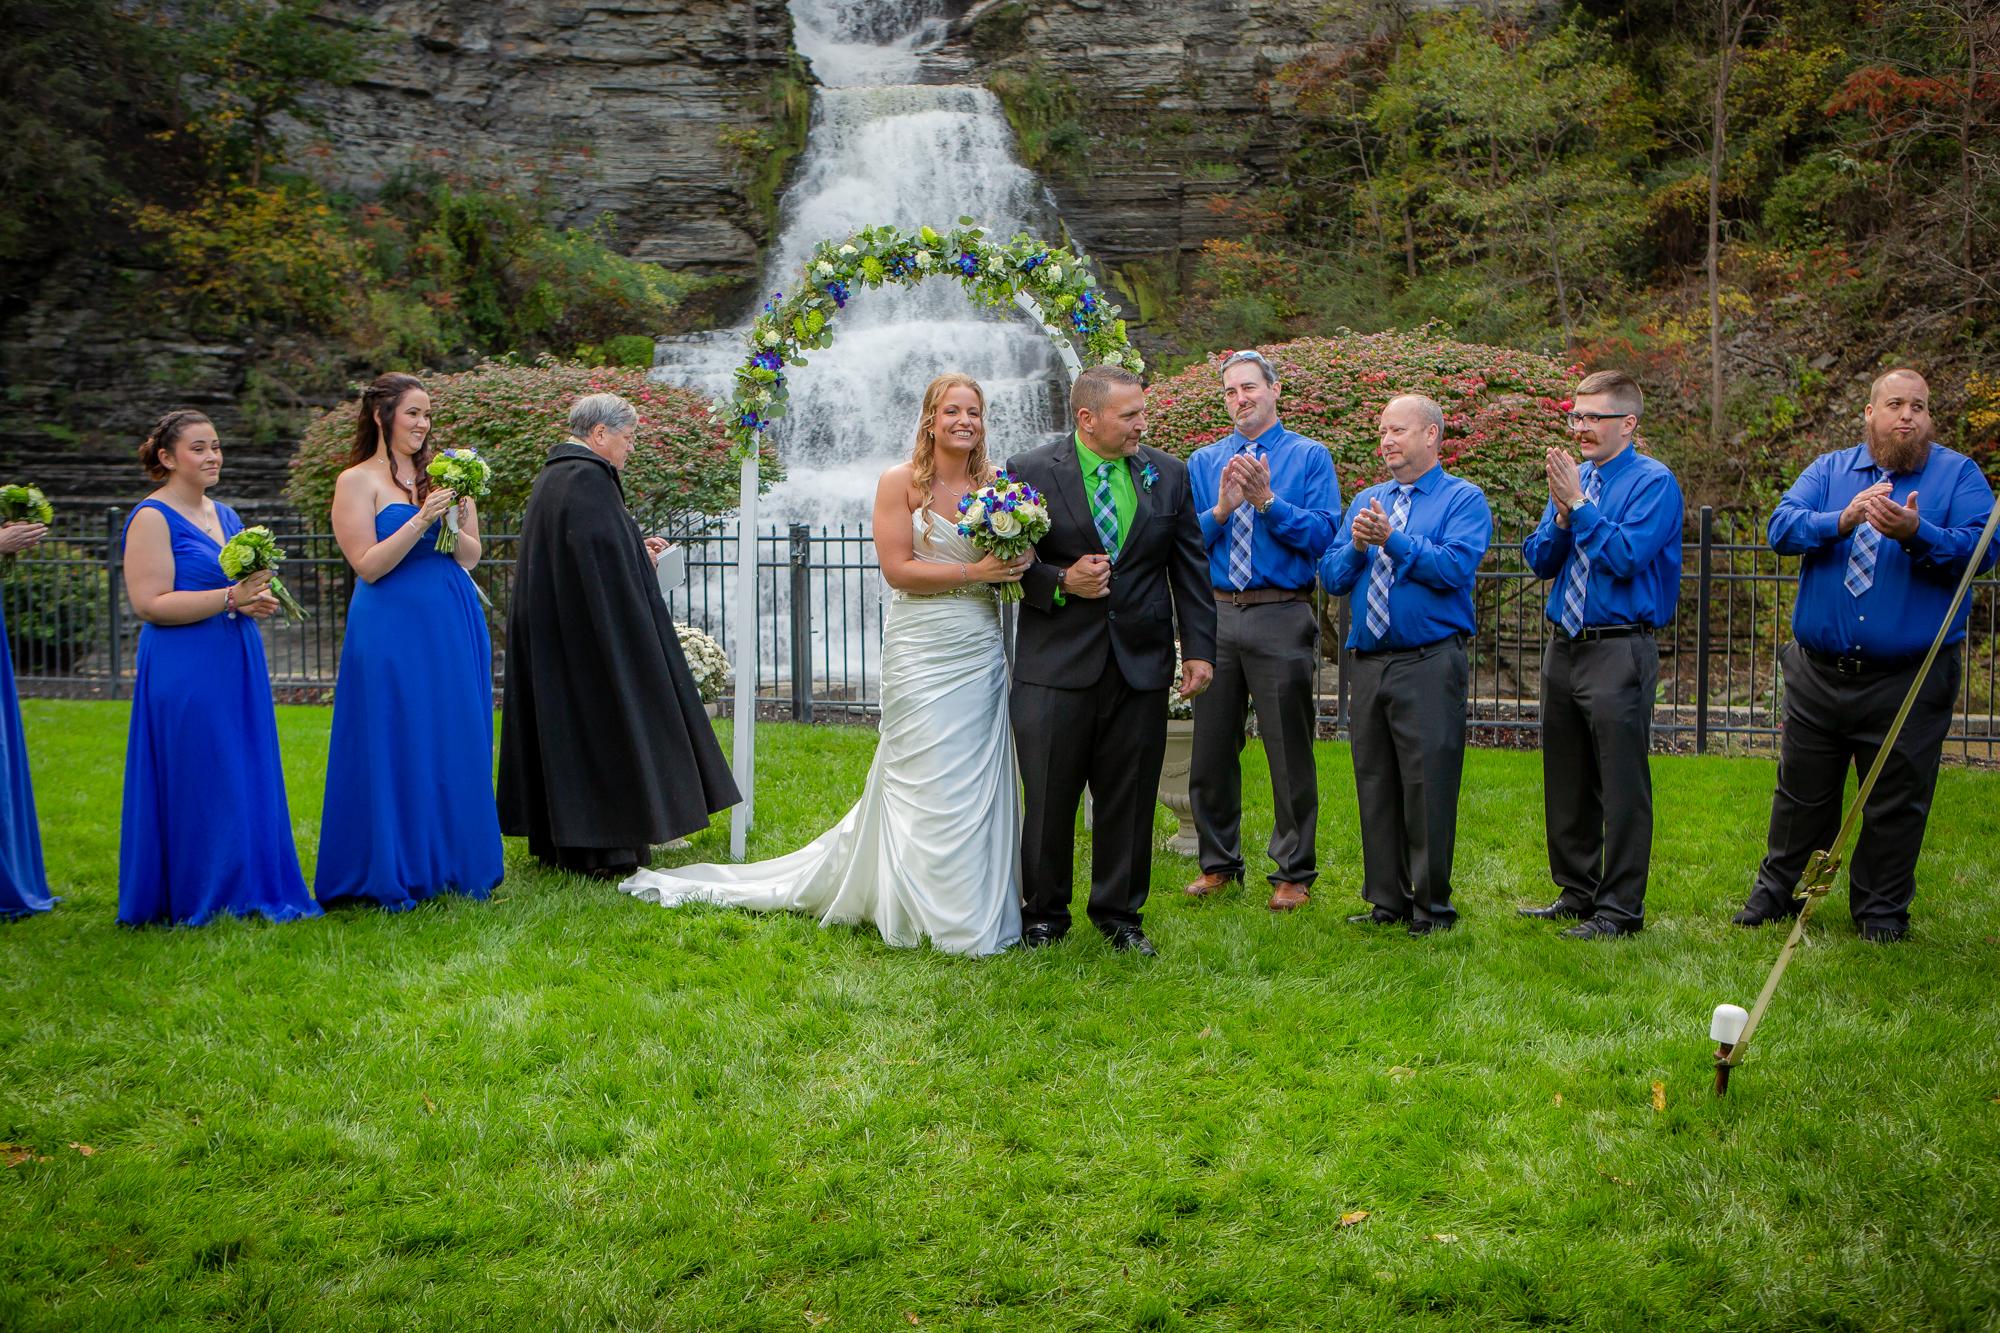 Raddison-Hotel-Corning-NY-Wedding-3937.jpg